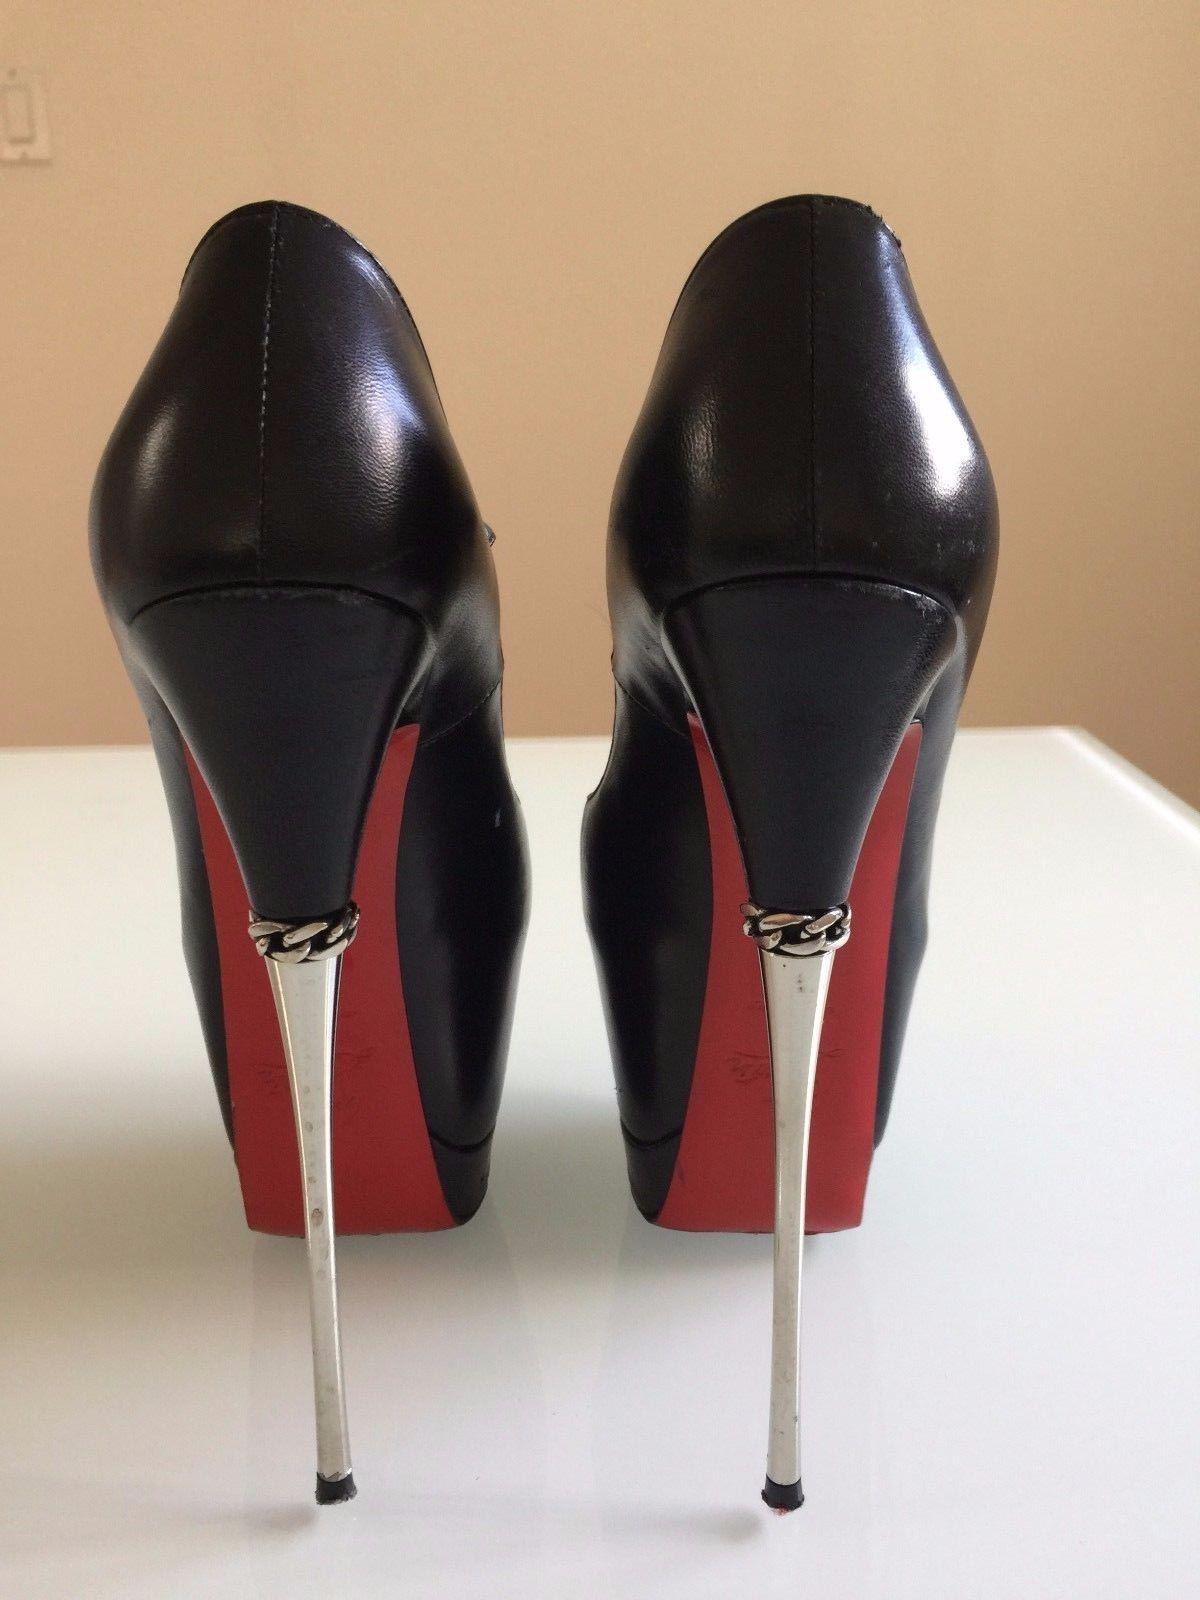 808aeebd8c82 Christian Louboutin Printz 160 Kid Leather Womens Heels Stiletto Peep Toe  36 6